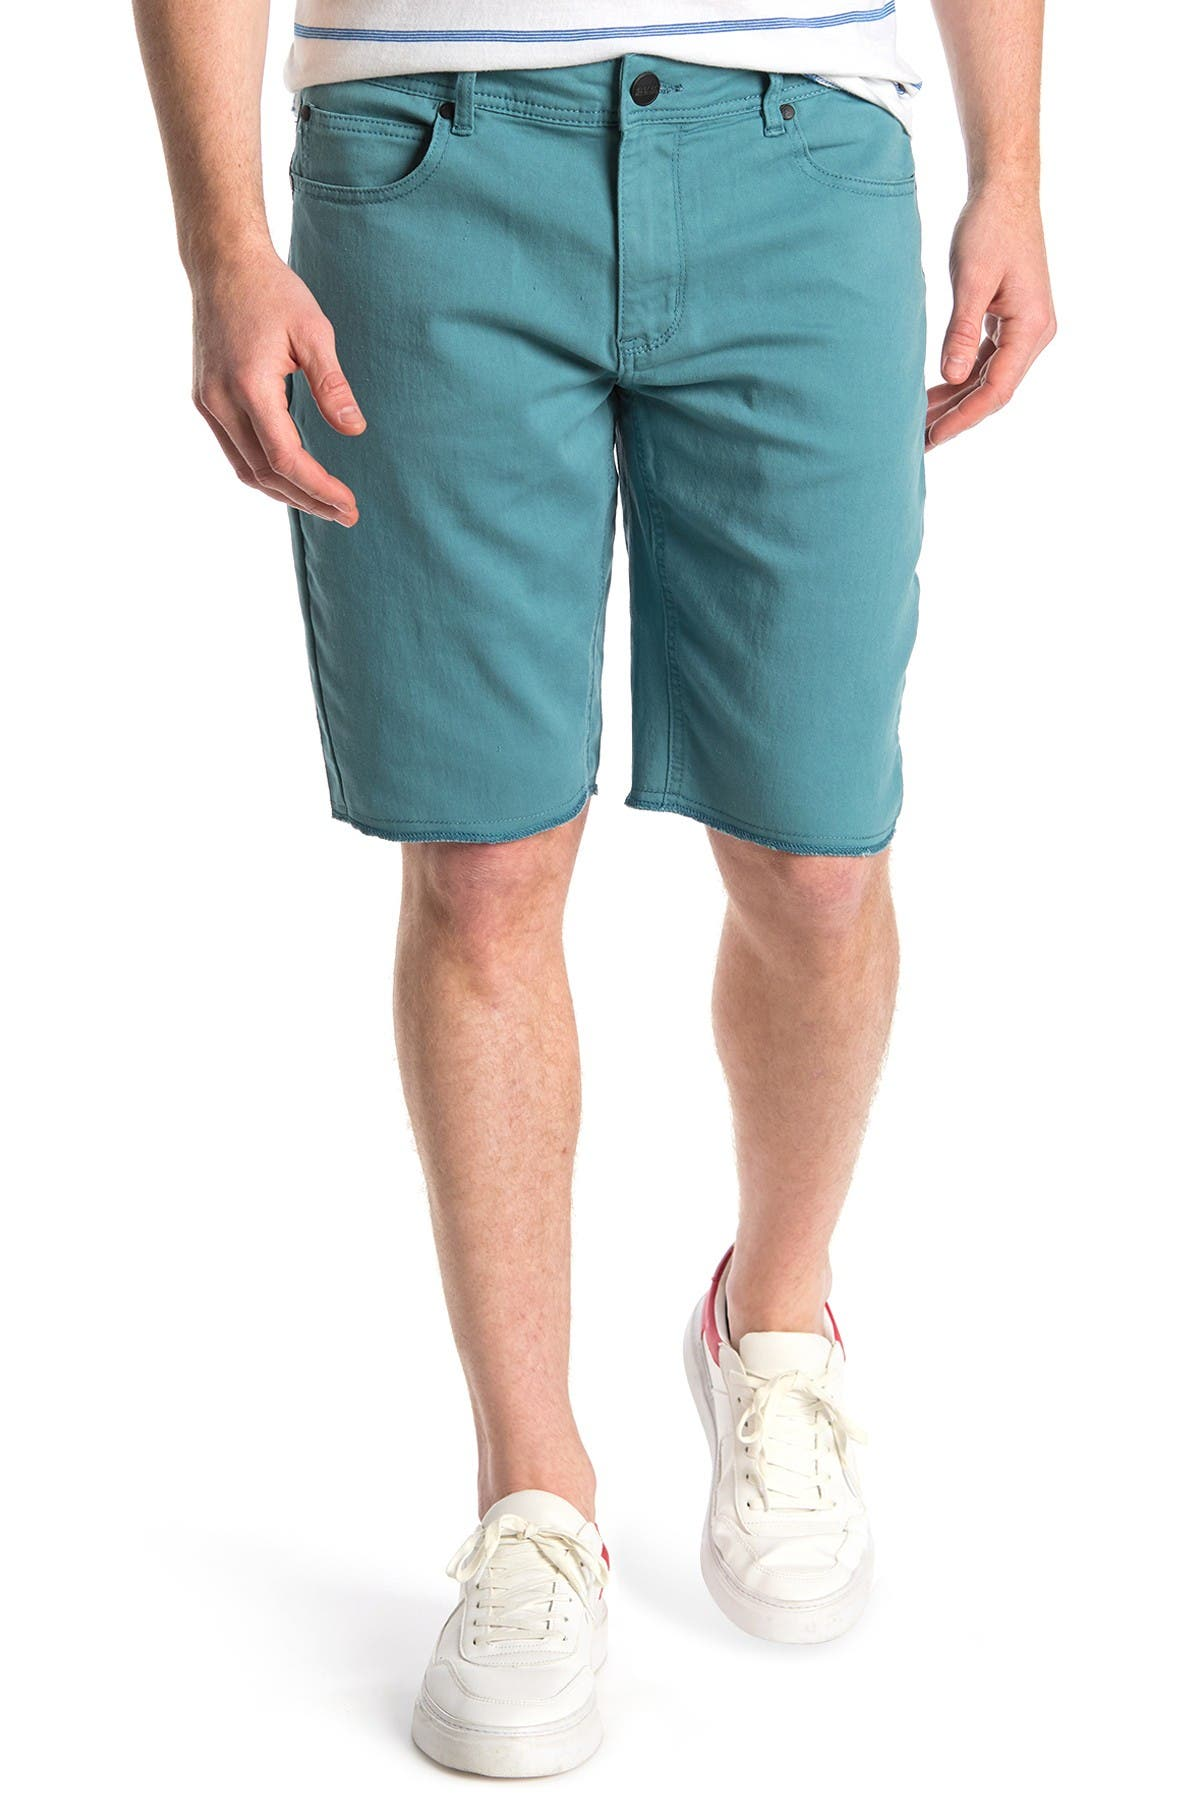 Image of Ezekiel Rebound Slim Denim Shorts